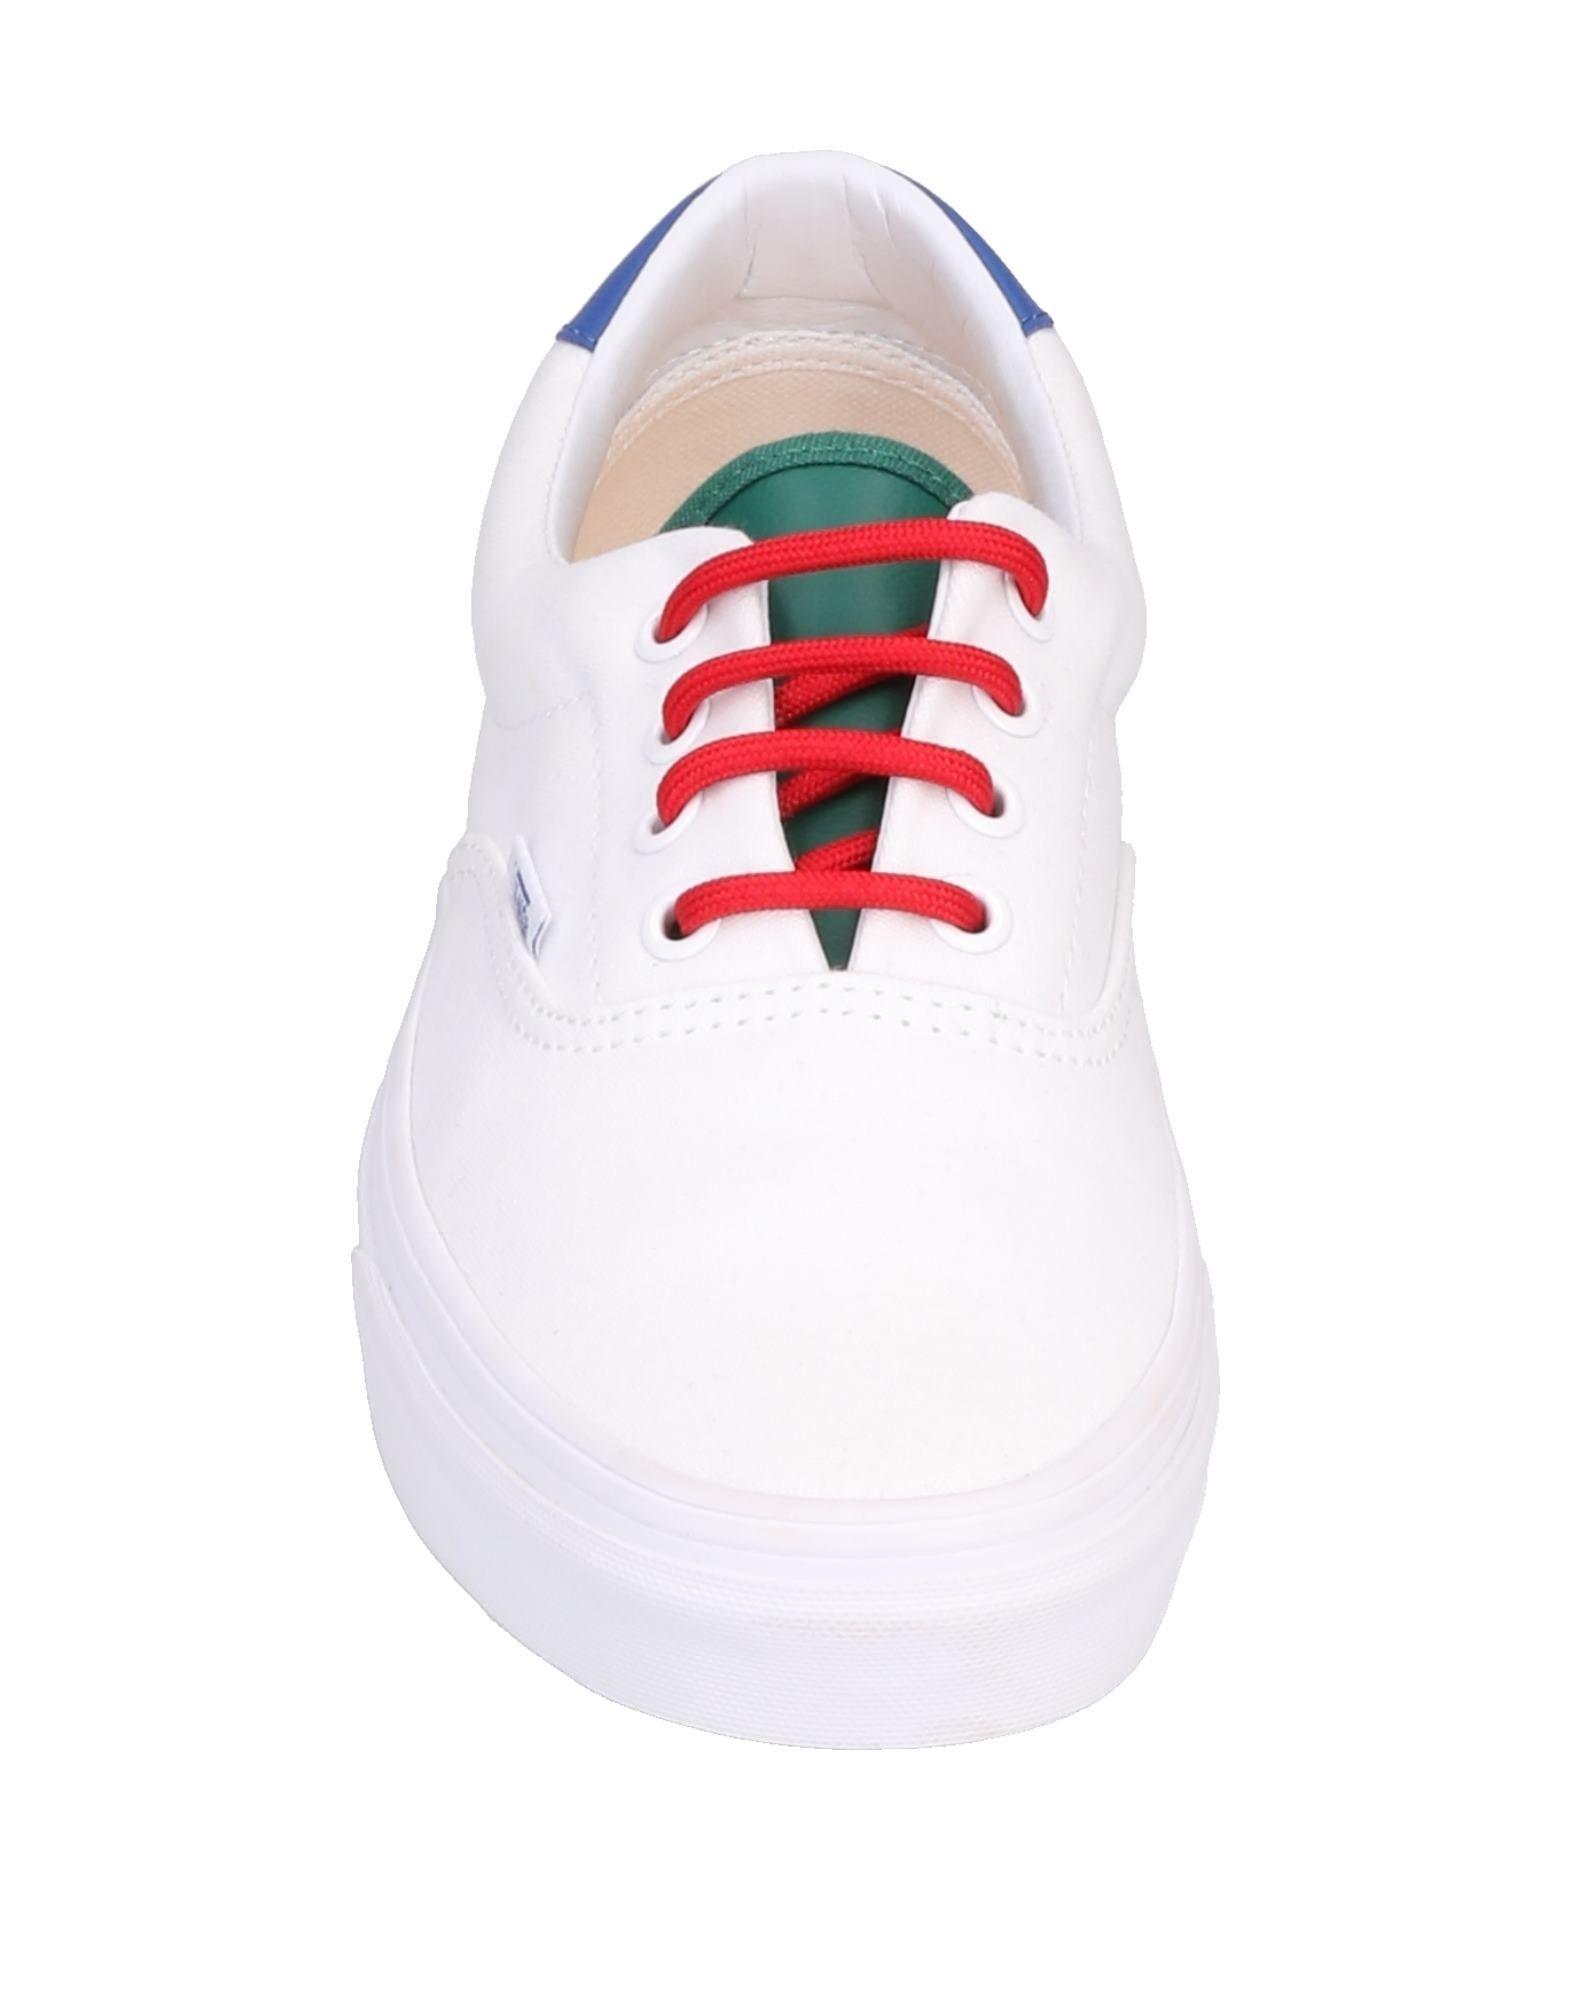 Vans Sneakers Damen Gutes Preis-Leistungs-Verhältnis, Preis-Leistungs-Verhältnis, Preis-Leistungs-Verhältnis, es lohnt sich 30f7cb